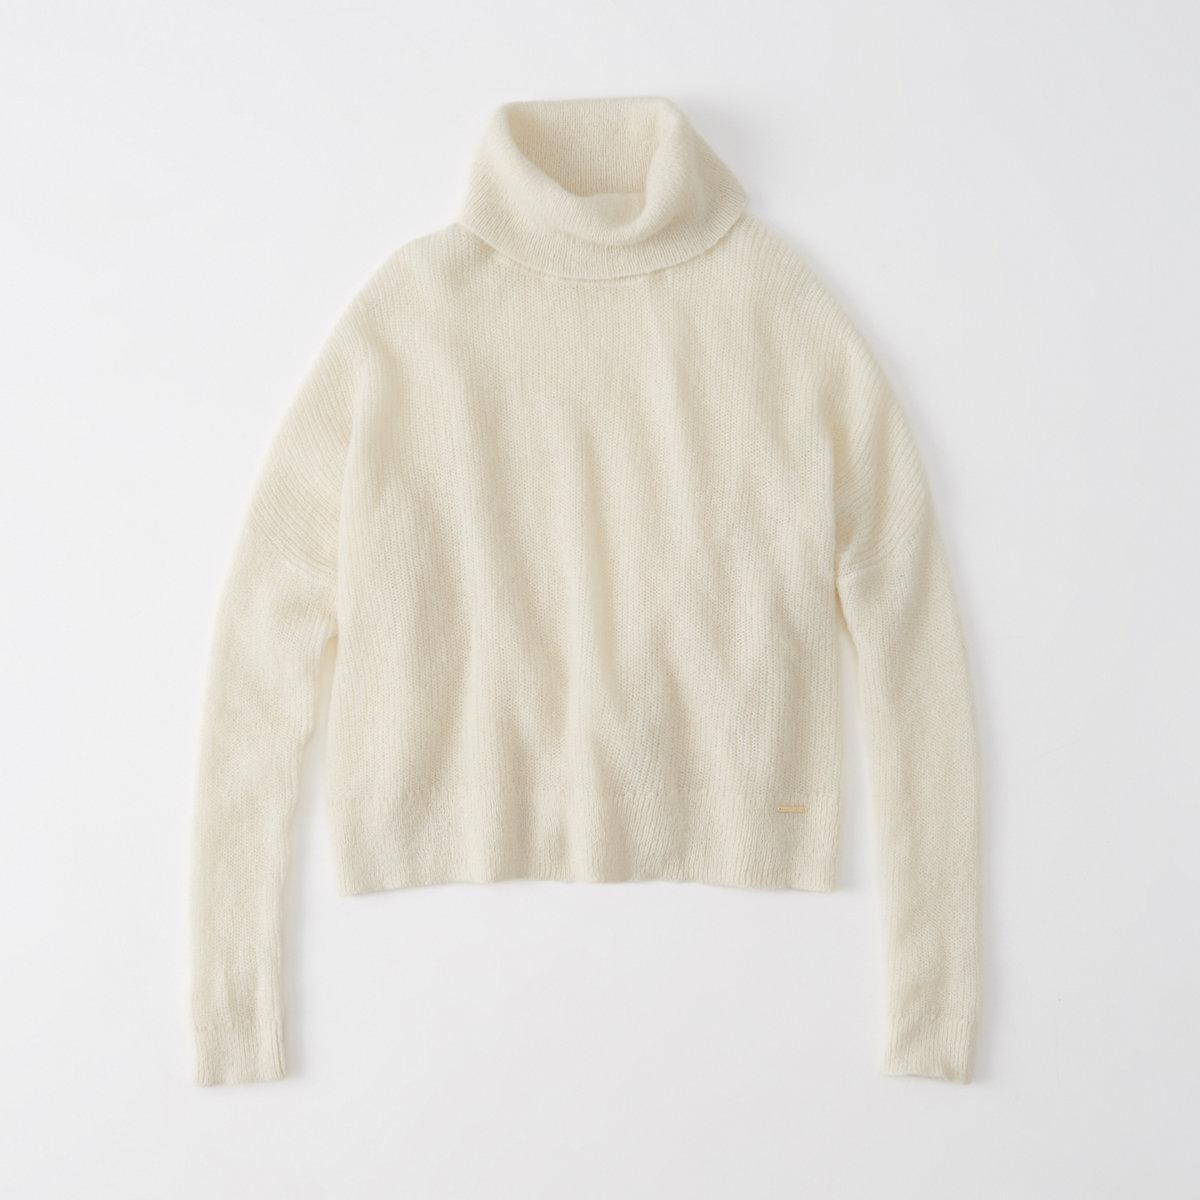 Mohair Blend Turtleneck Sweater